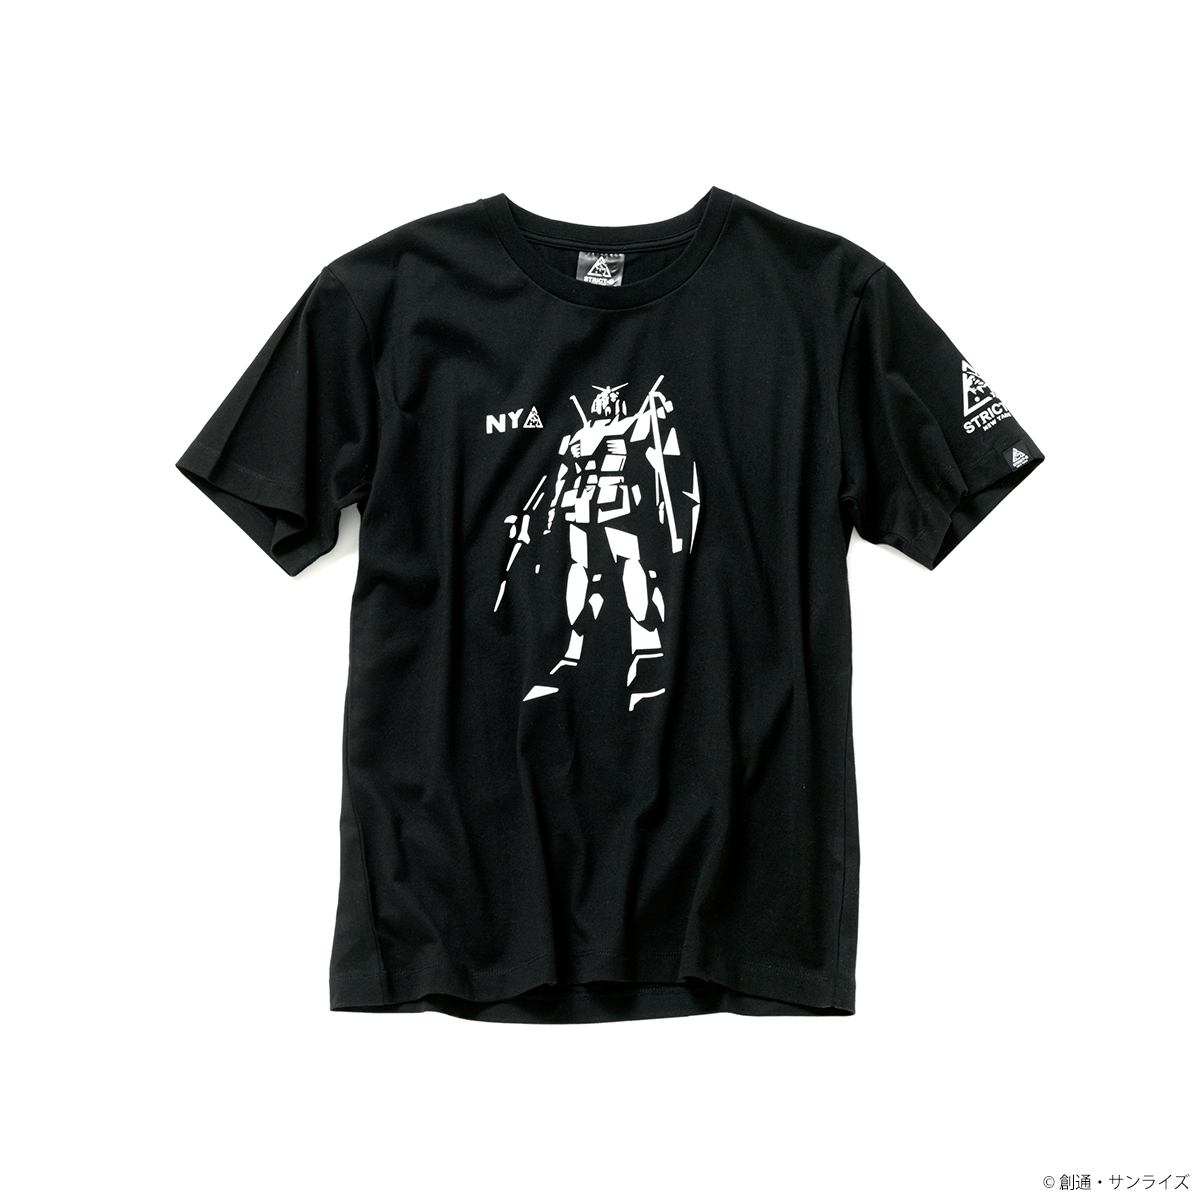 STRICT-G NEW YARK Tシャツ ガンダムスタンディング柄